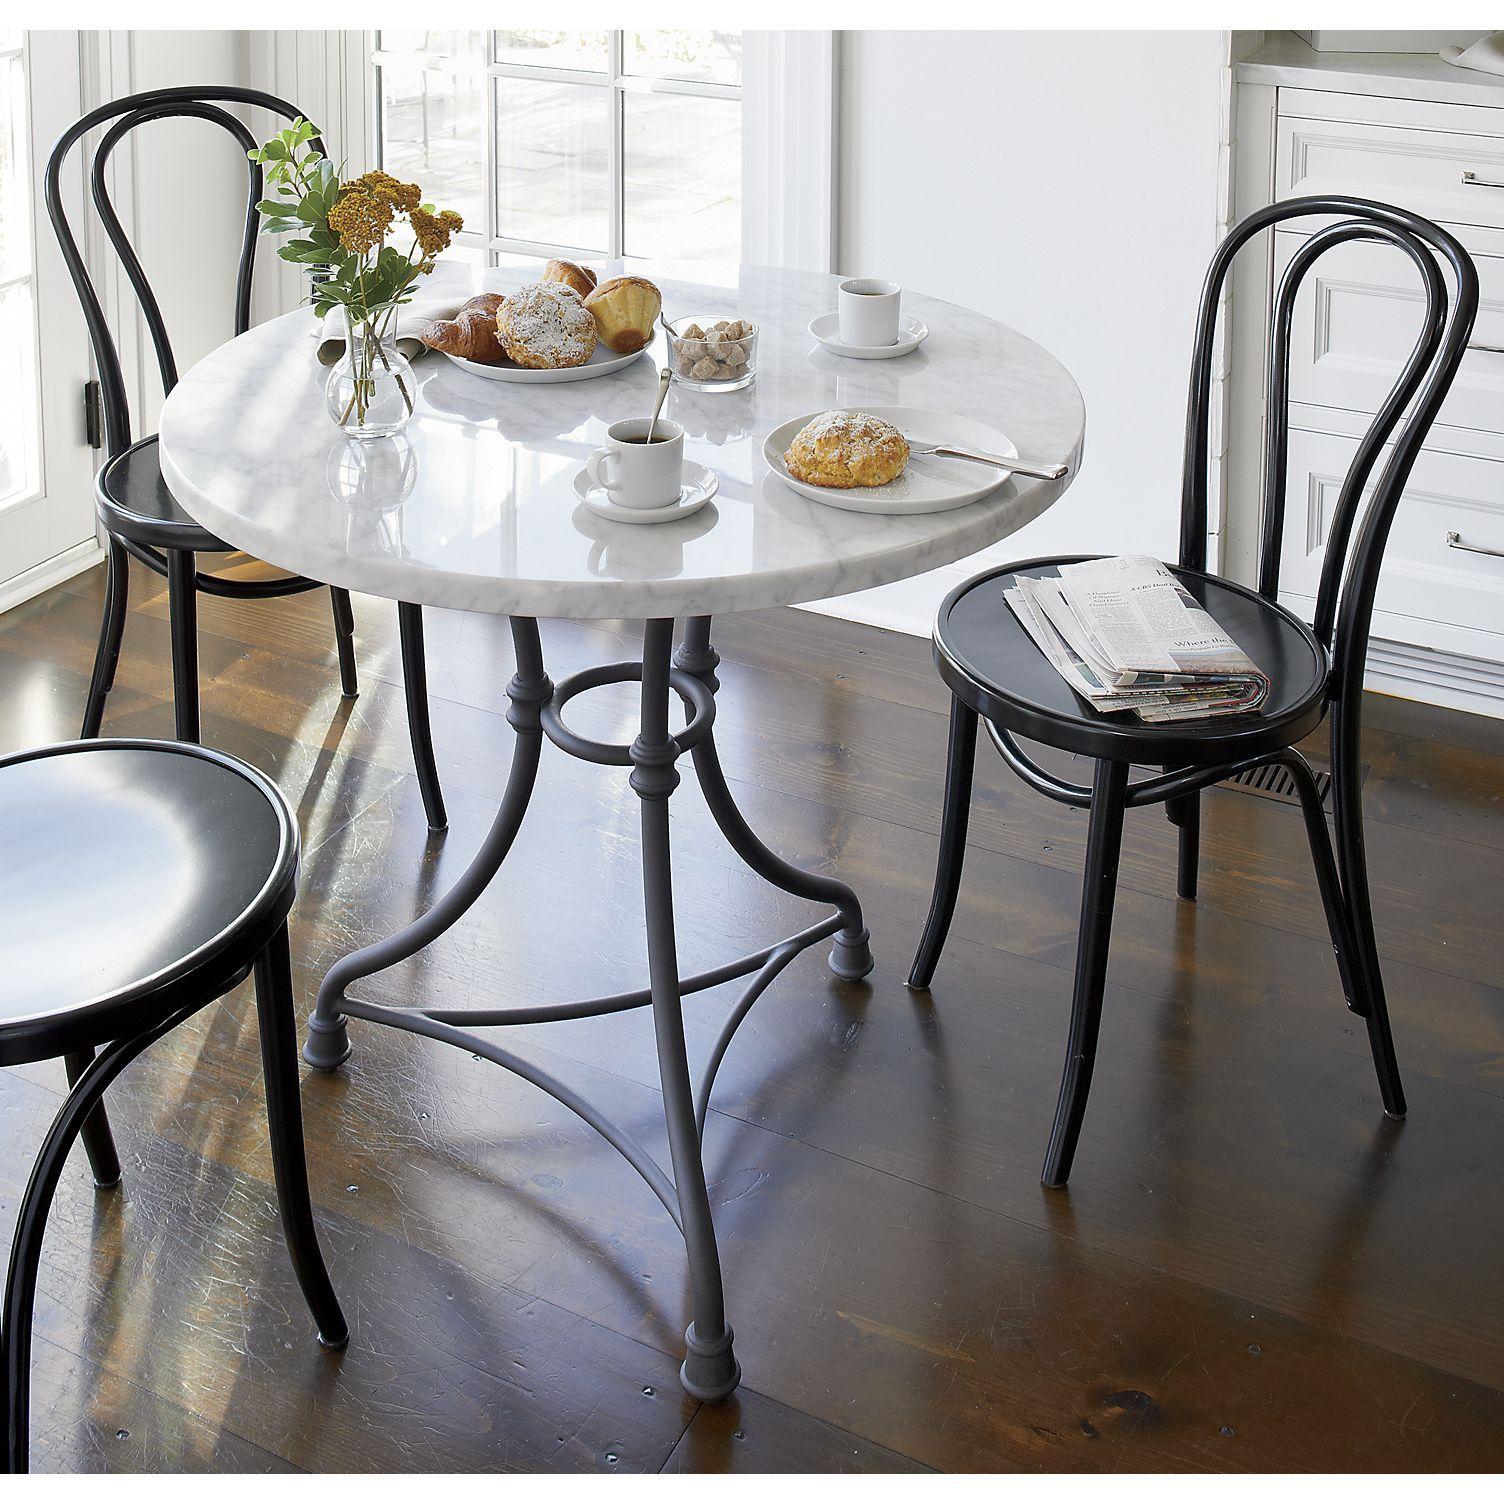 French kitchen table  French Kitchen Round Bistro Table  French kitchens Carrara marble